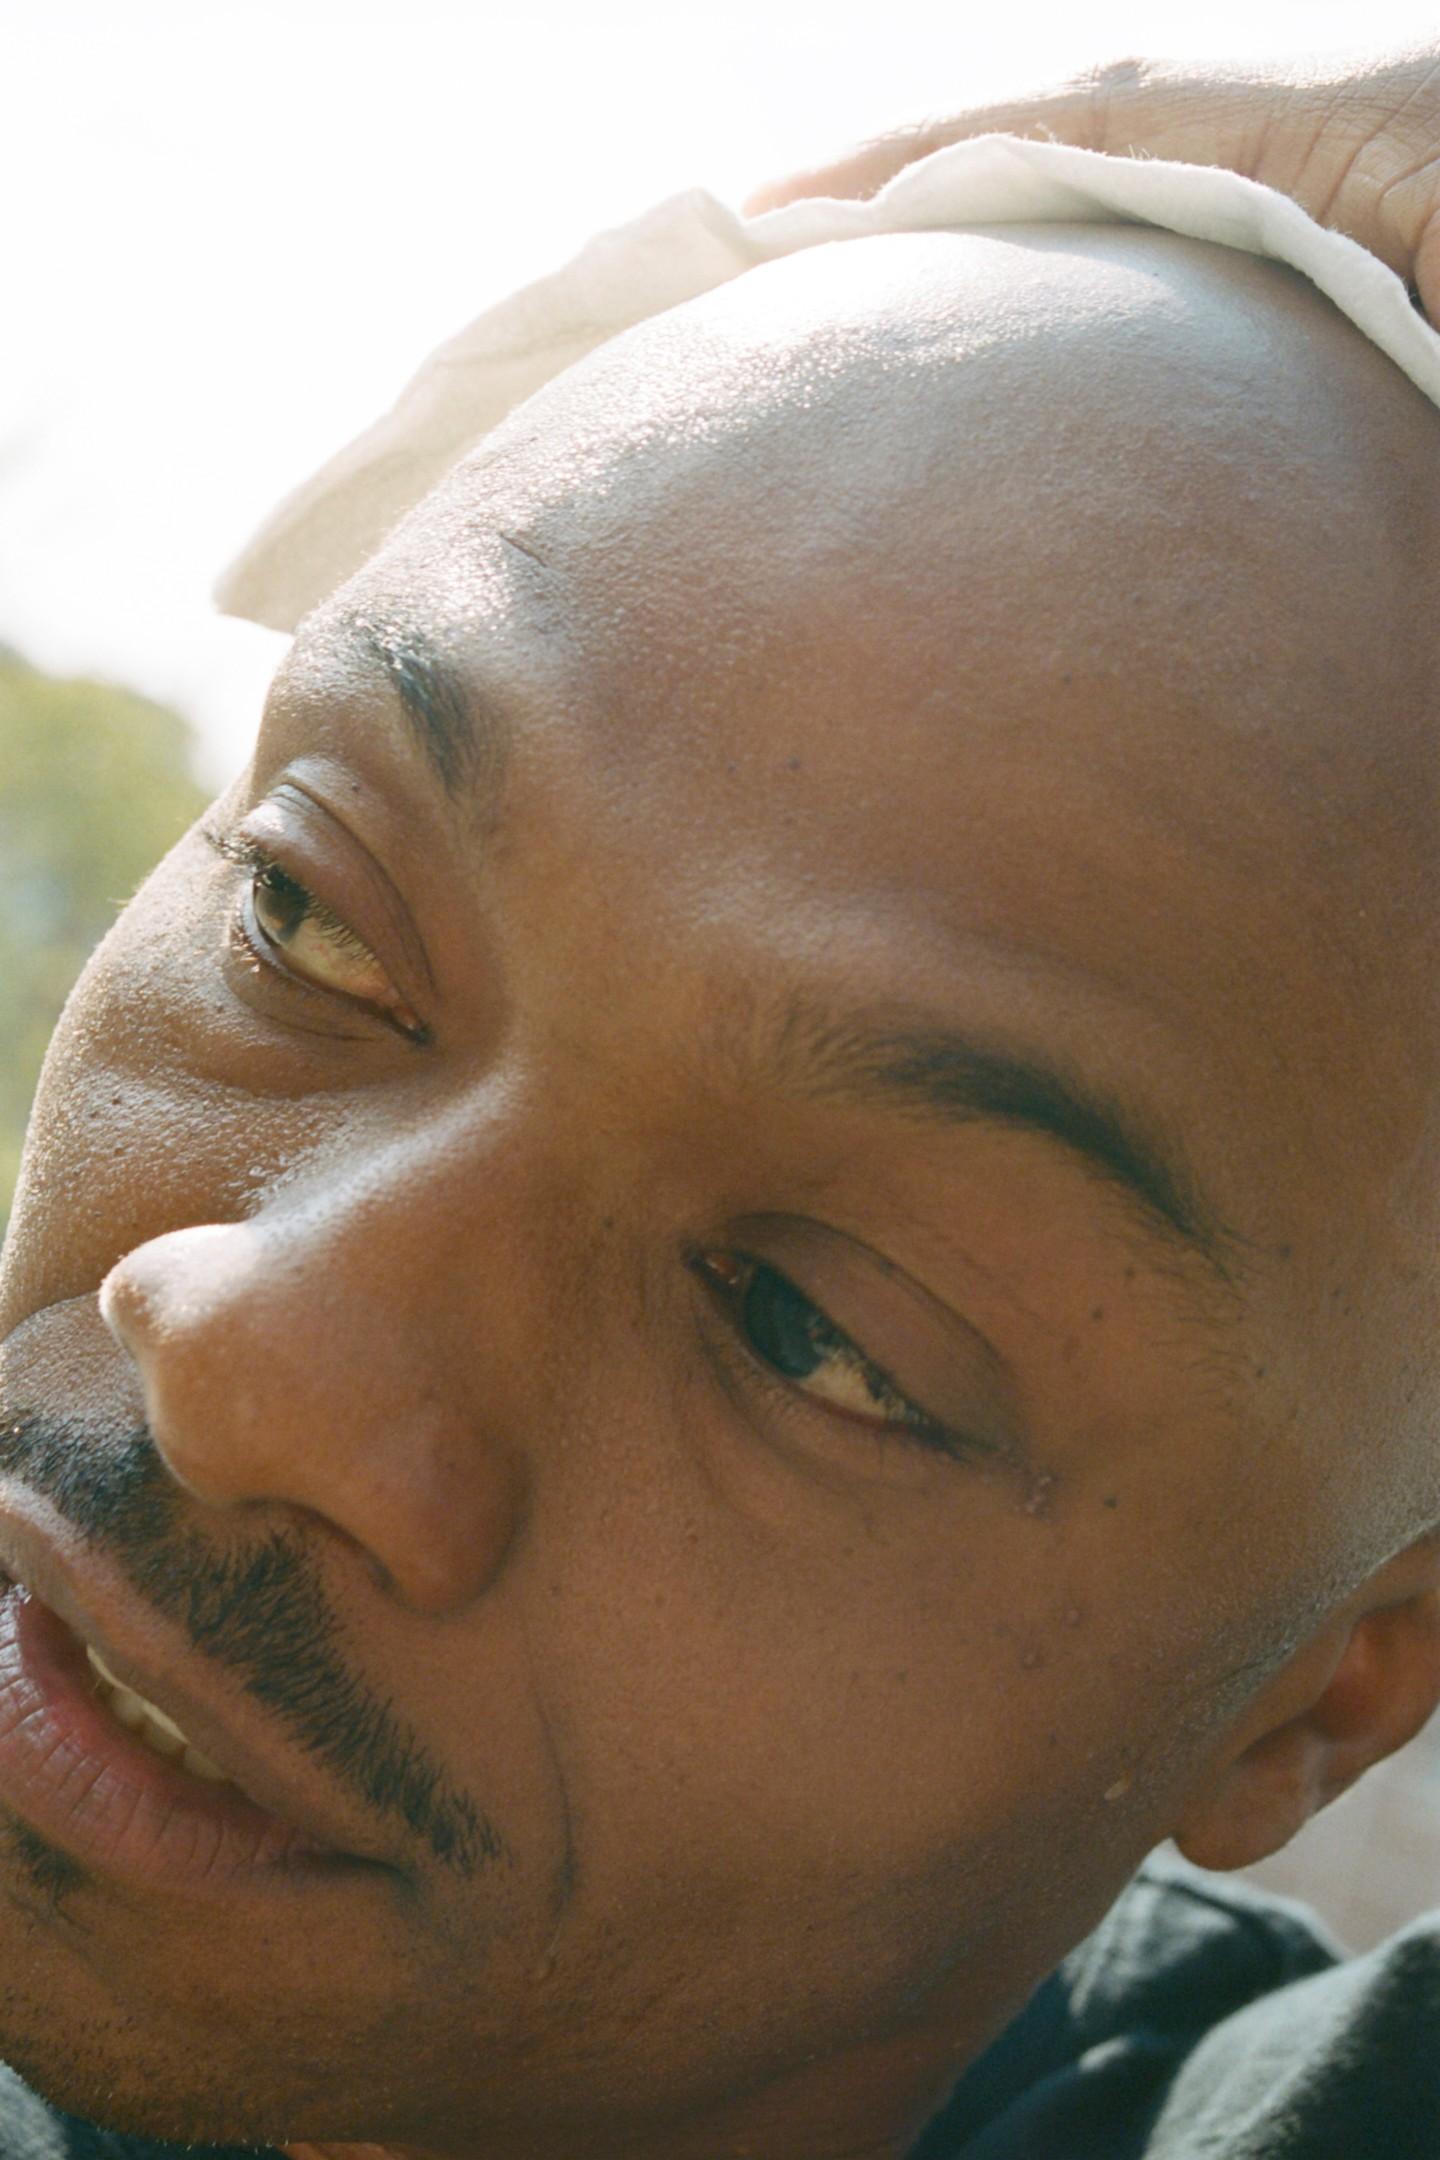 New York Raps Greatest Living Treasure The Fader